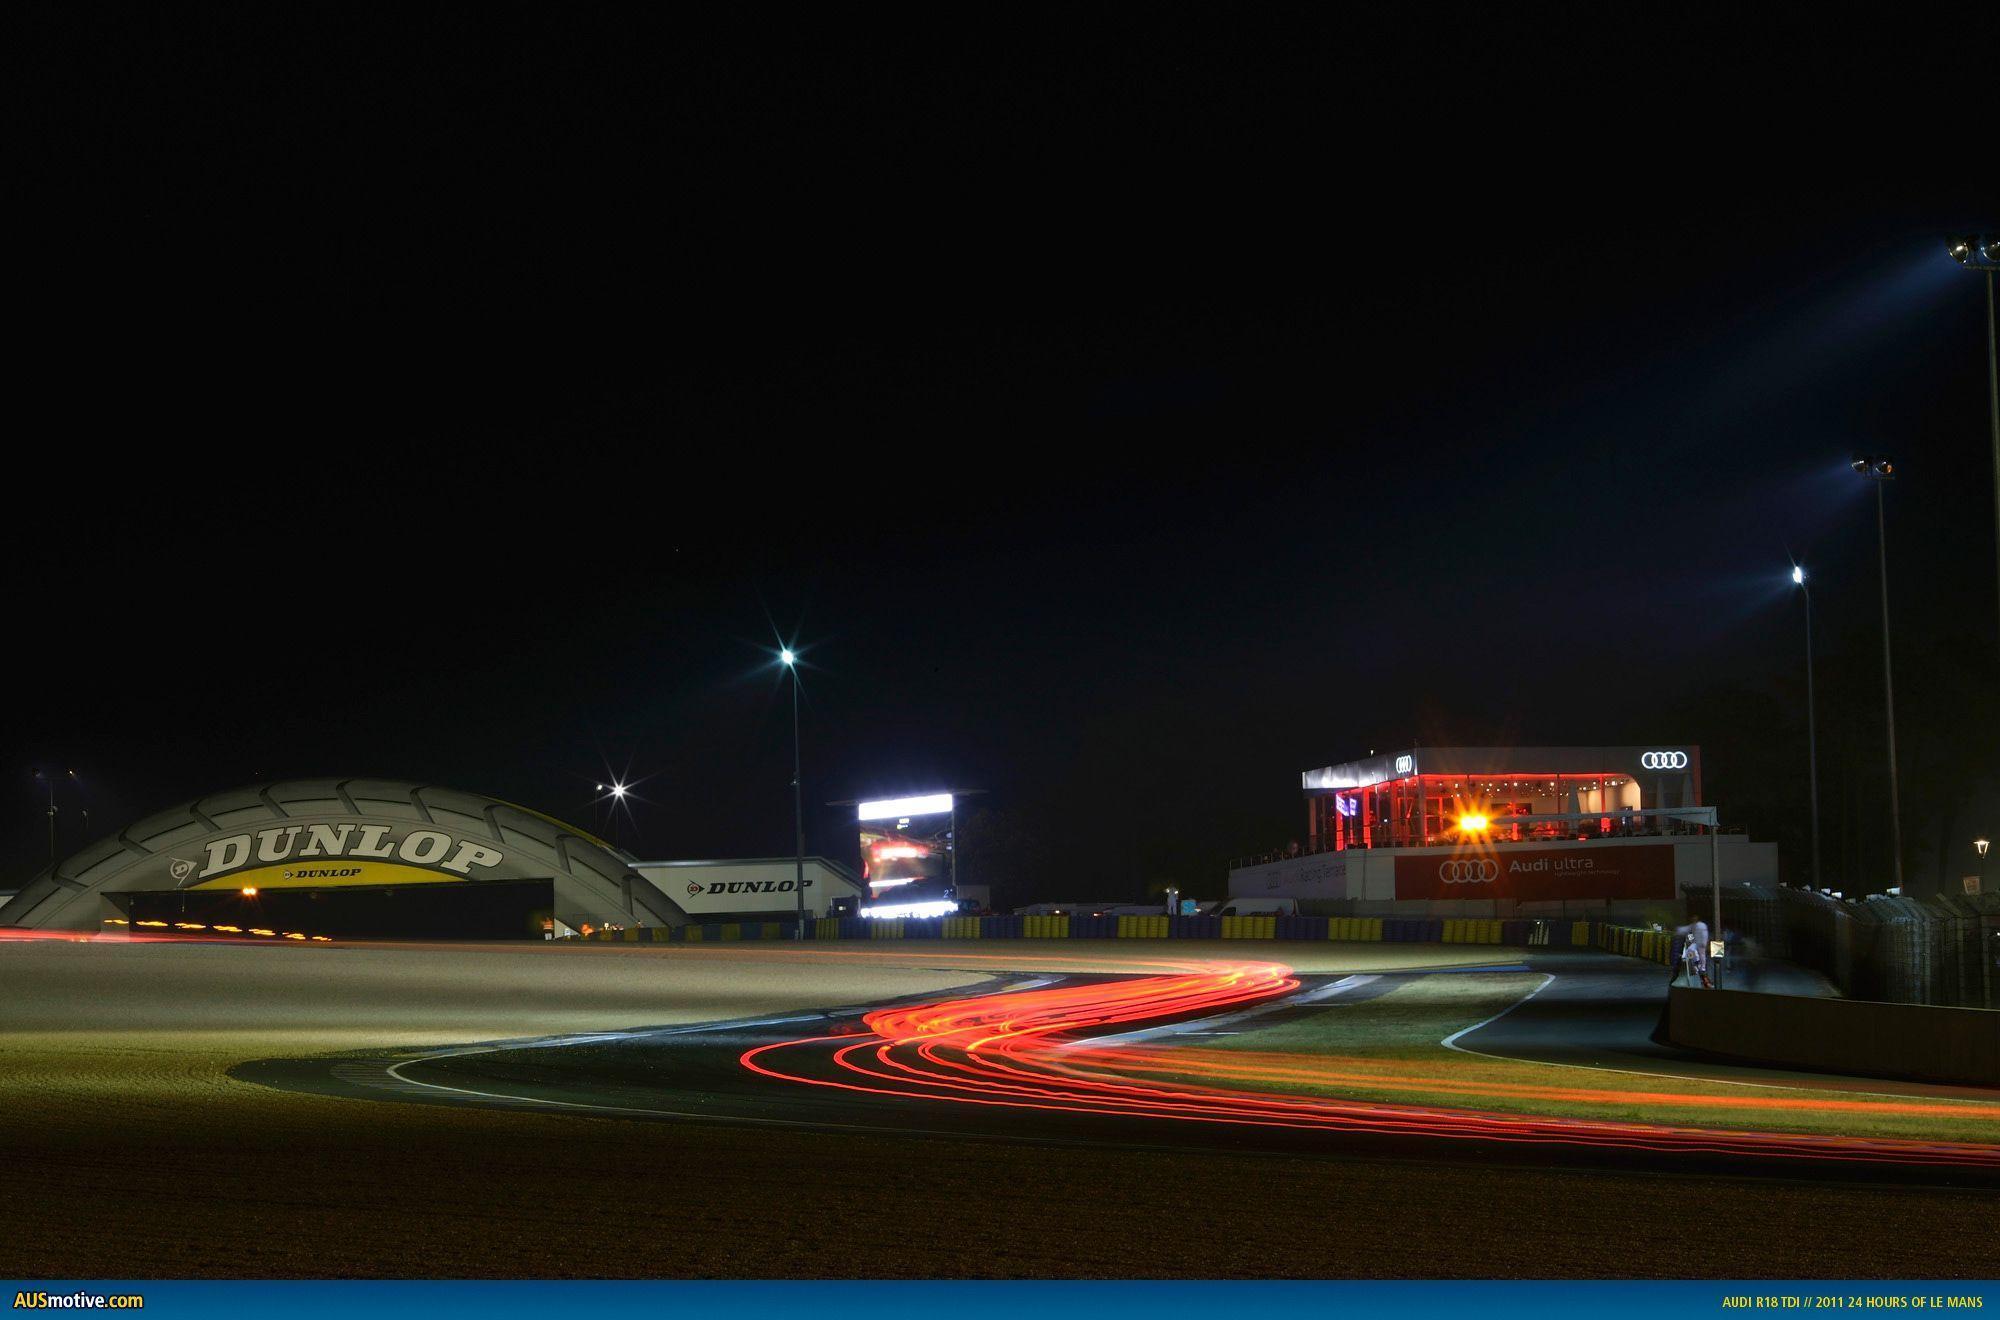 AUSmotive.com » Reliving Audi's 10th 24 Hours of Le Mans victory